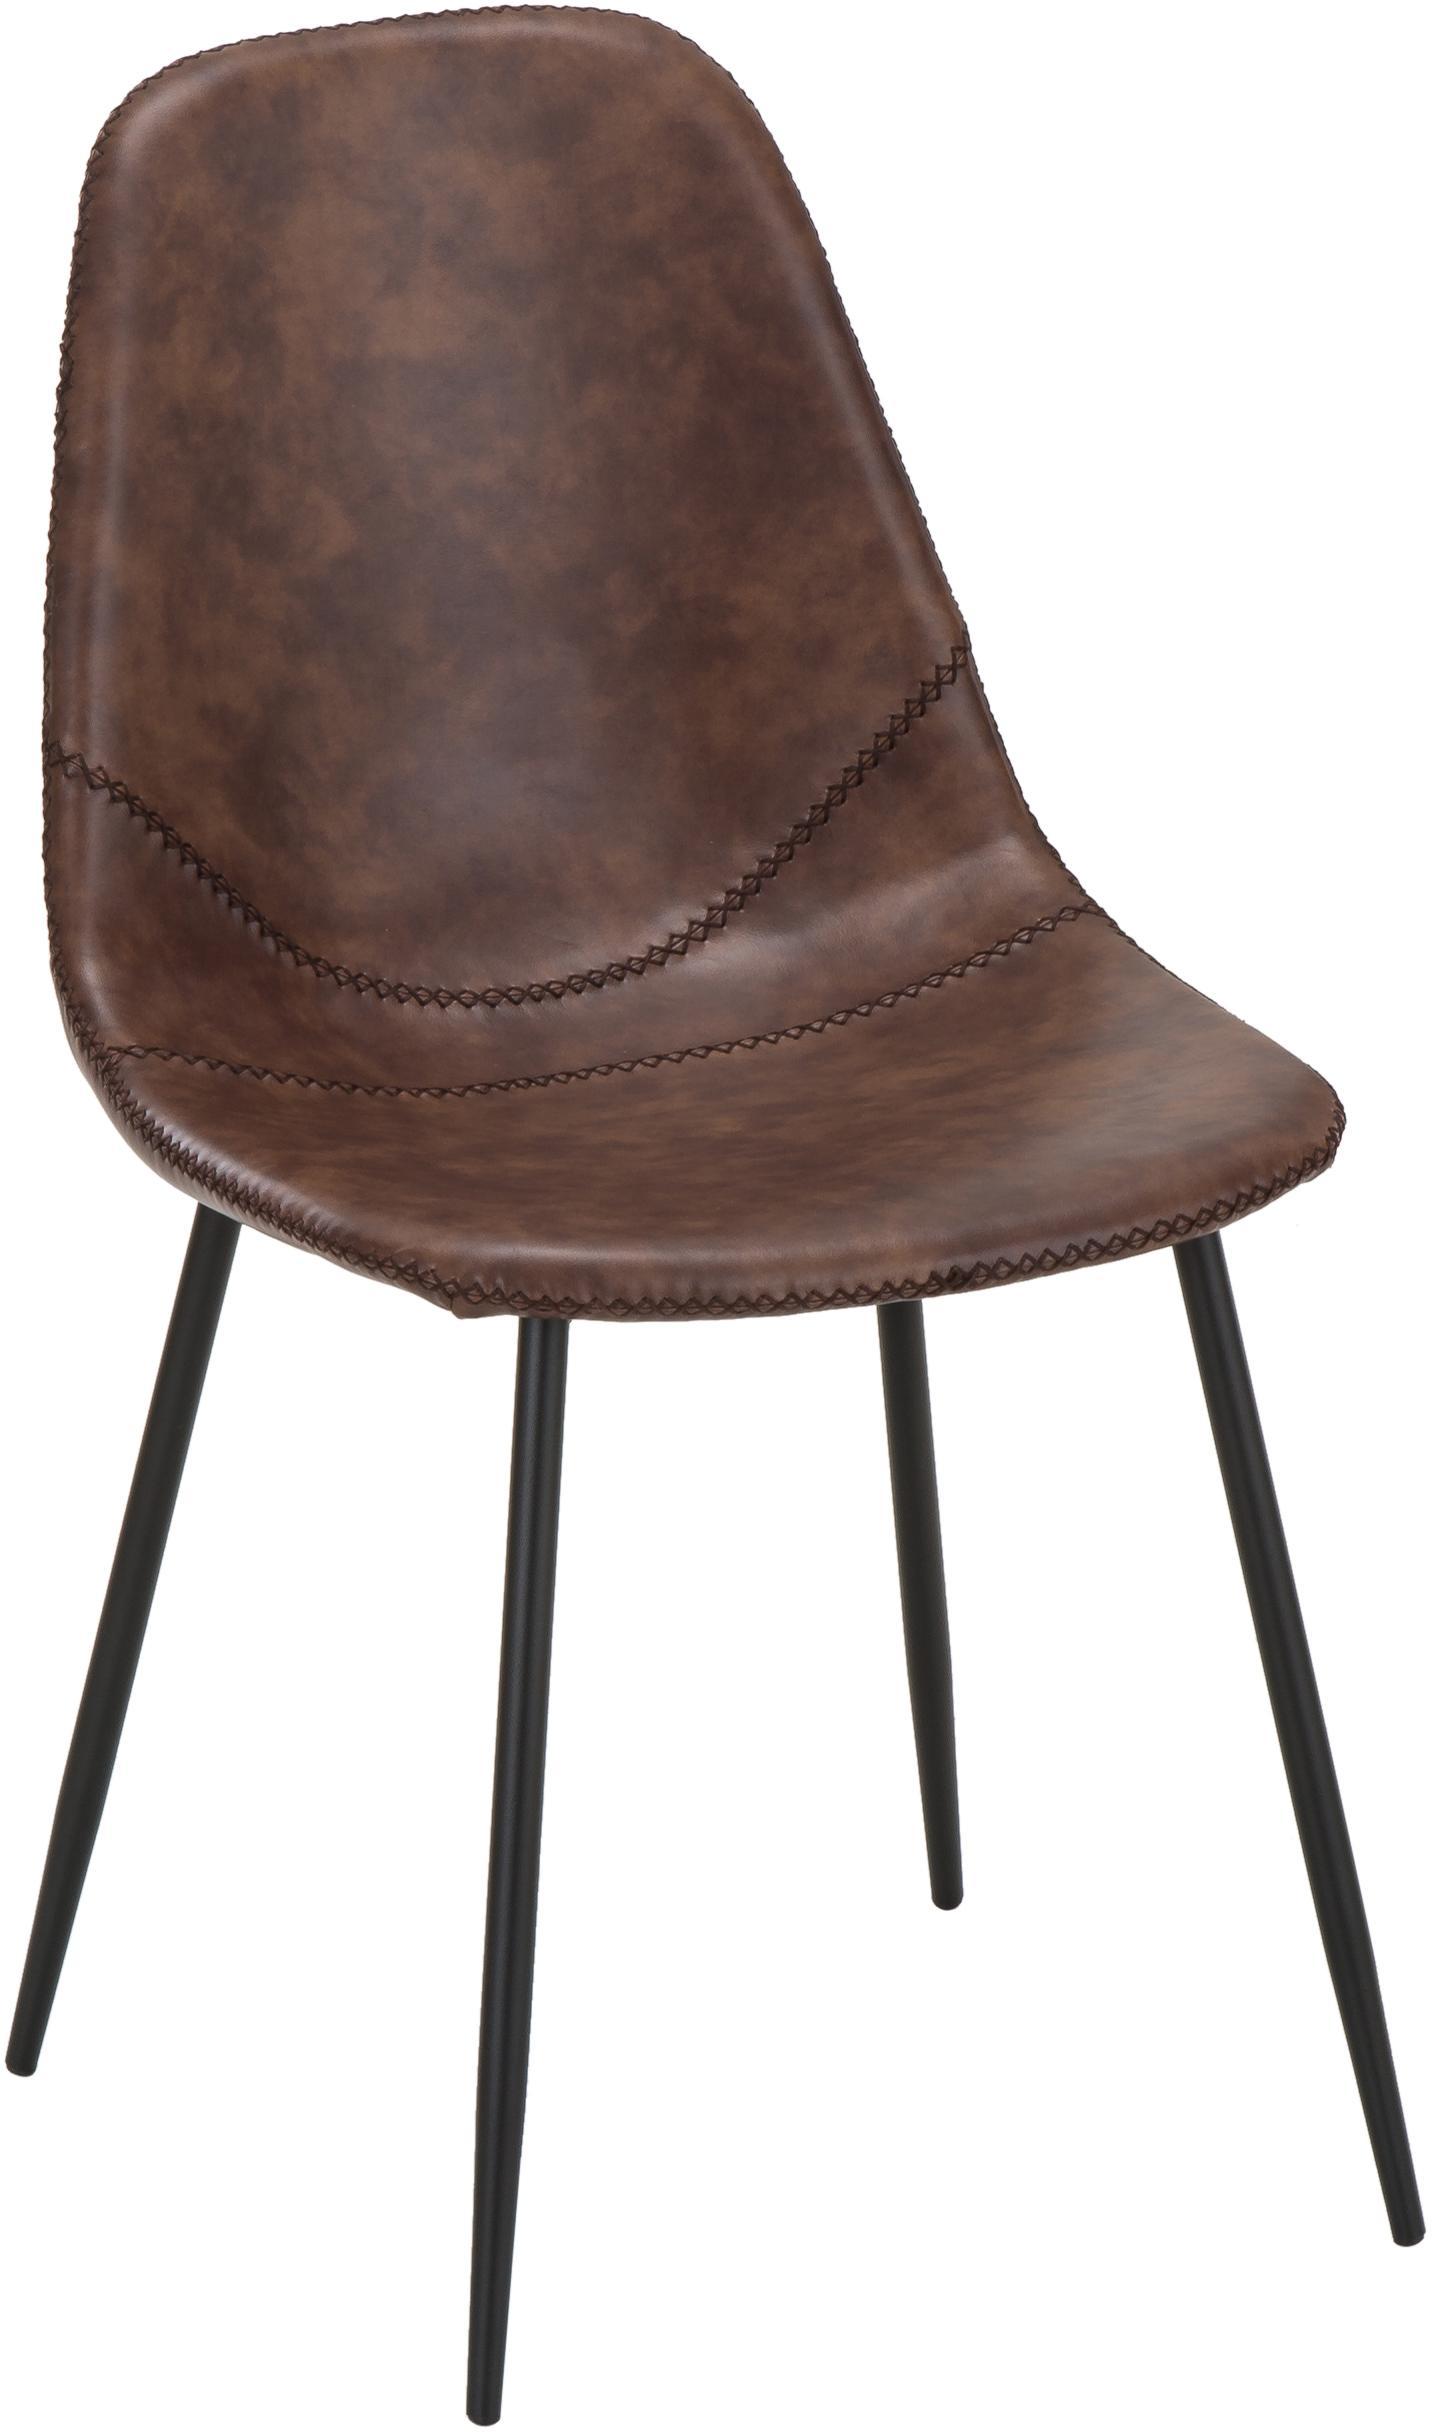 Sedia imbottita in similpelle Linus 2 pz, Rivestimento: similpelle (65% polietile, Gambe: metallo verniciato a polv, Rivestimento: marrone gambe: nero opaco, Larg. 41 x Prof. 53 cm